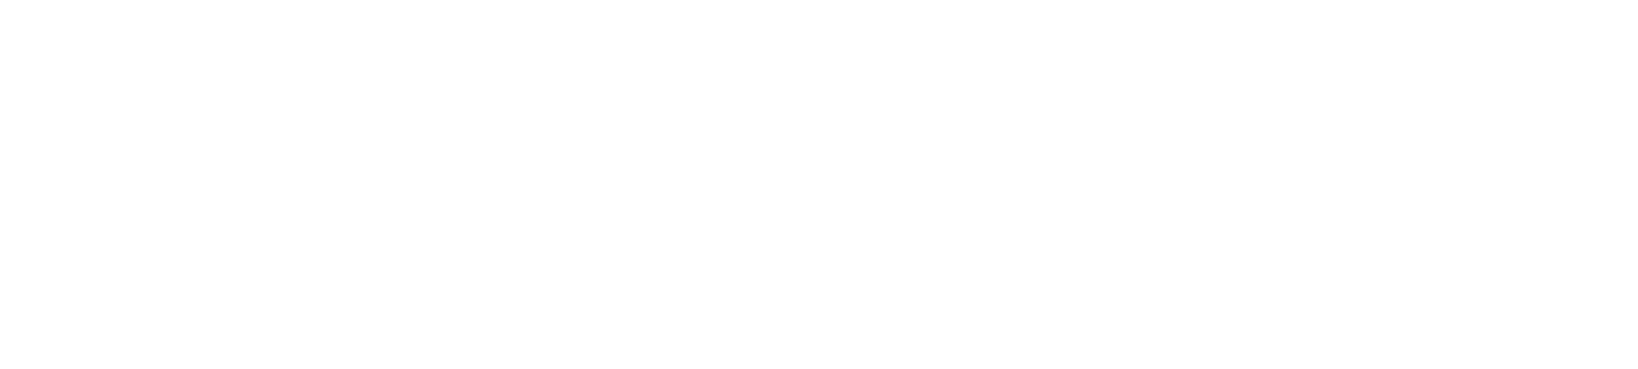 Zoom-Video-Communications_Logo_2020